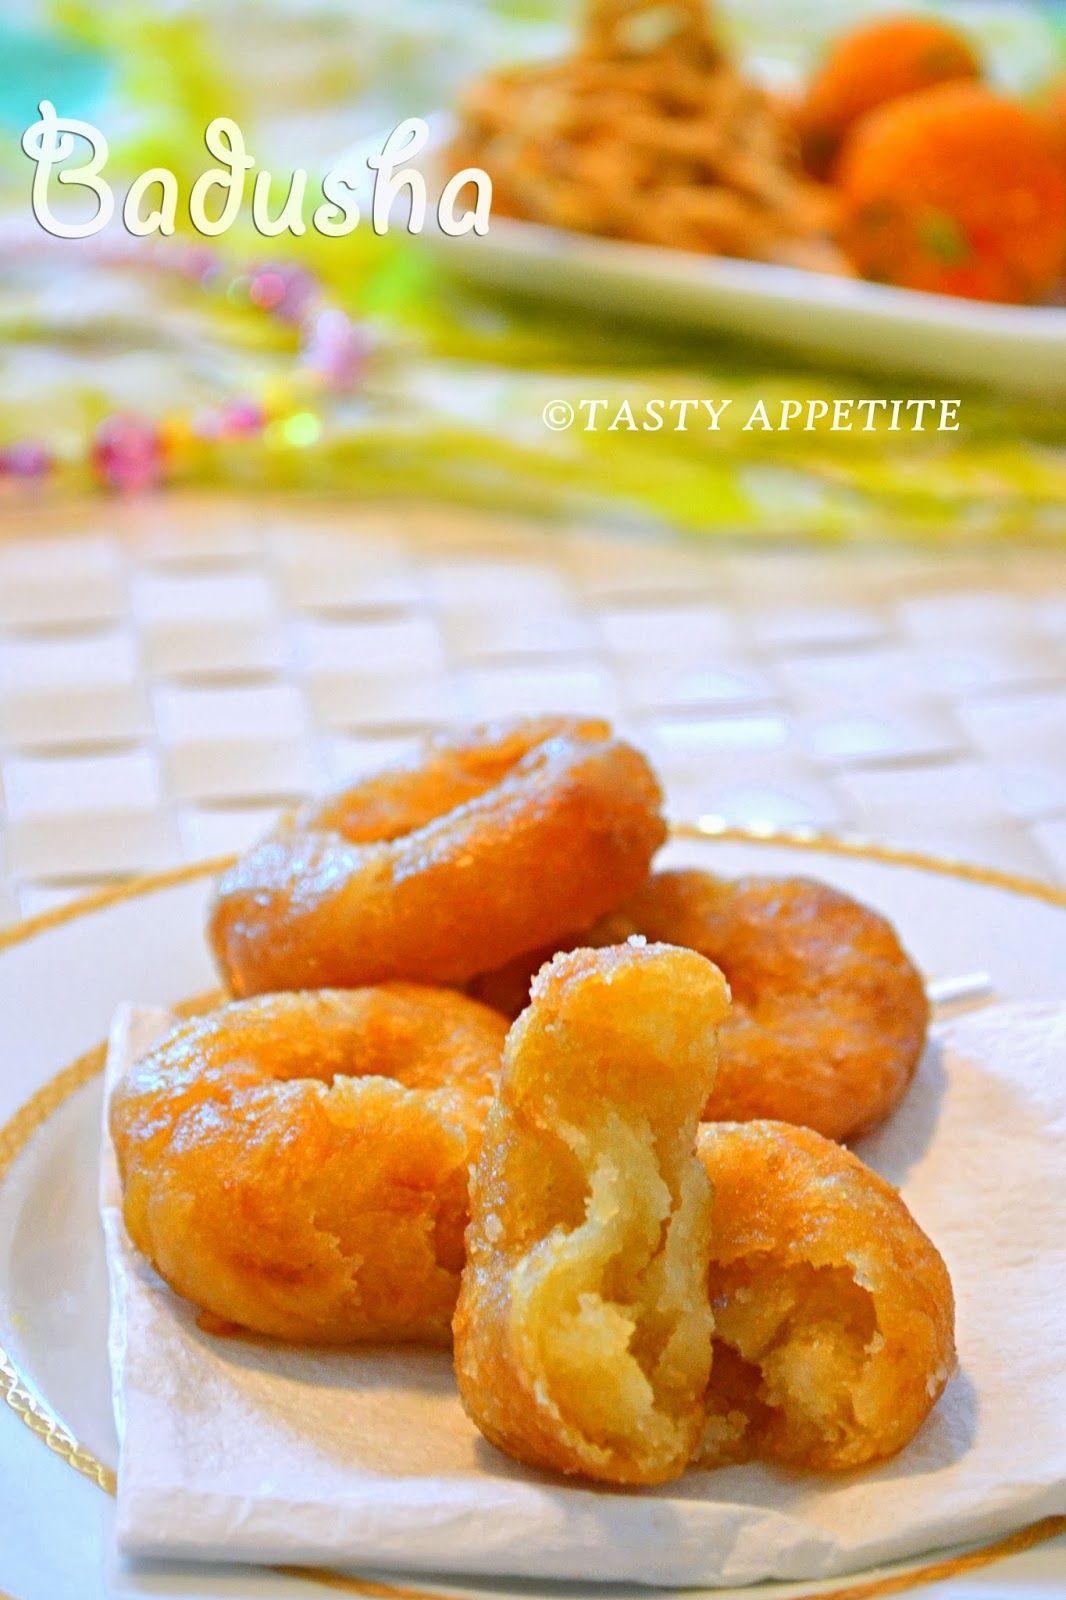 Badusha Sweet Recipe Easy Step By Indian Food RecipesIndian DessertsIndian